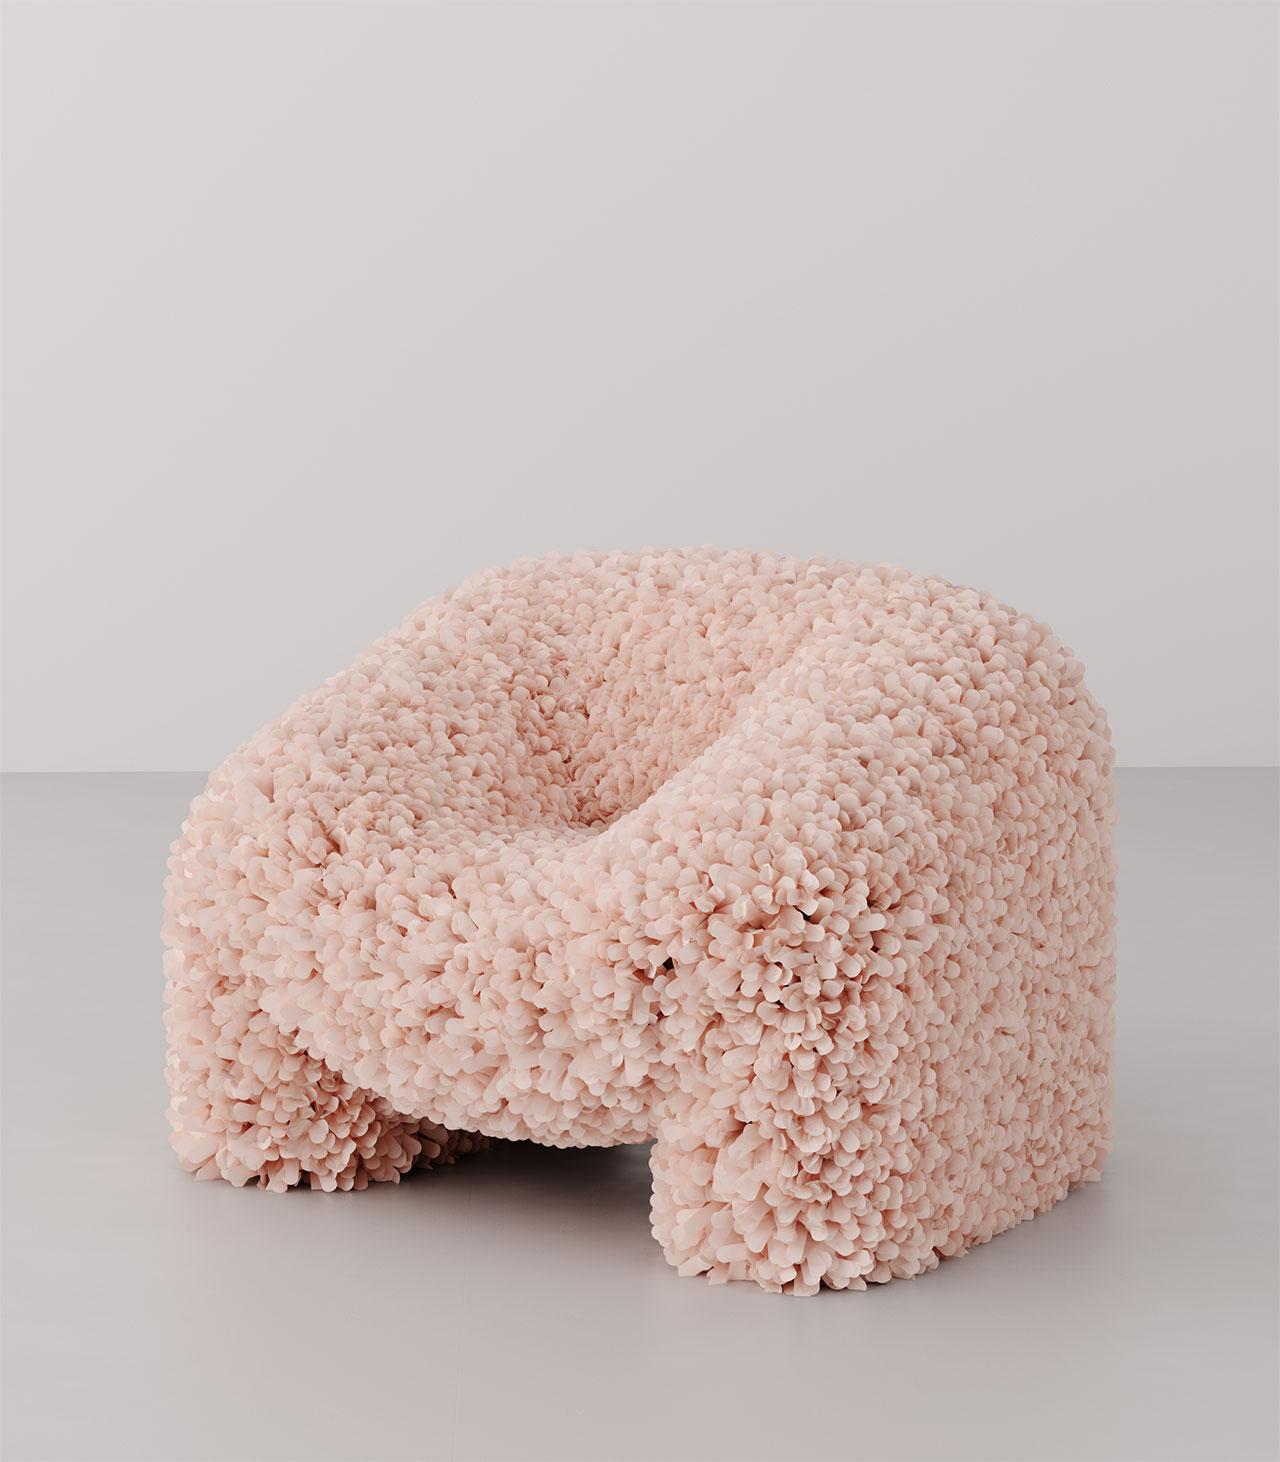 Andrés Reisinger (co-designer Júlia Esqué), Hortensia Chair, 2018-2019. Photo © Andrés Reisinger & Júlia Esqué